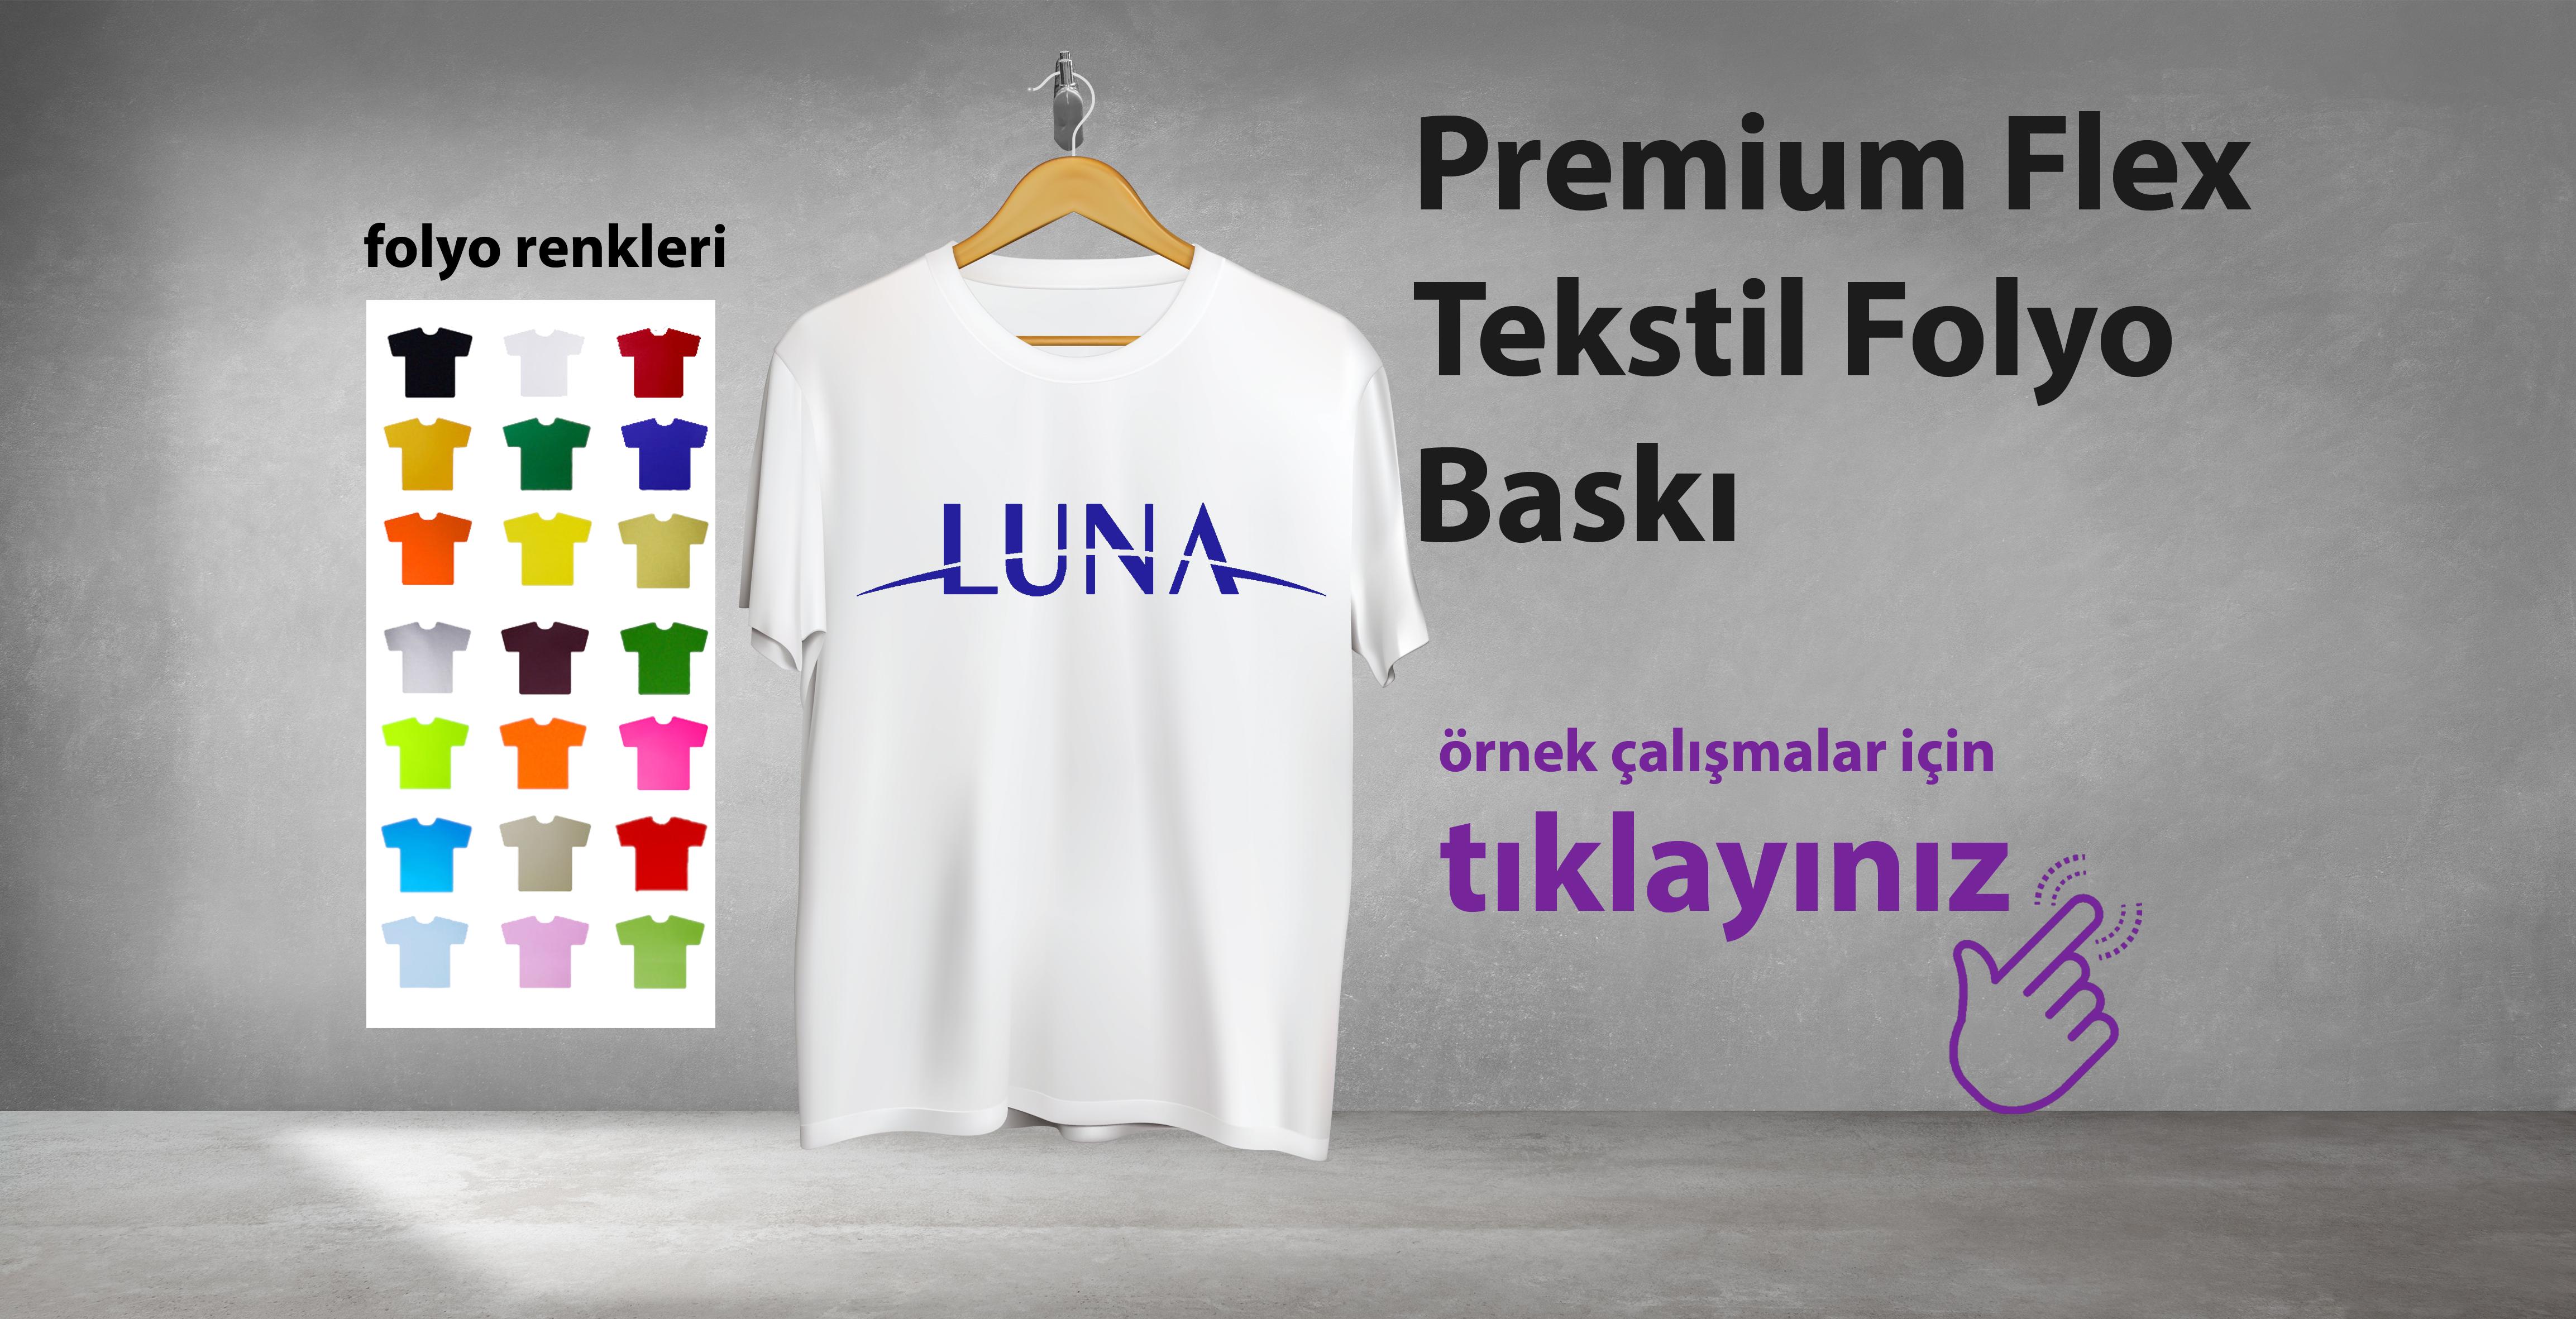 Premium Flex Tekstil Folyo Baskı